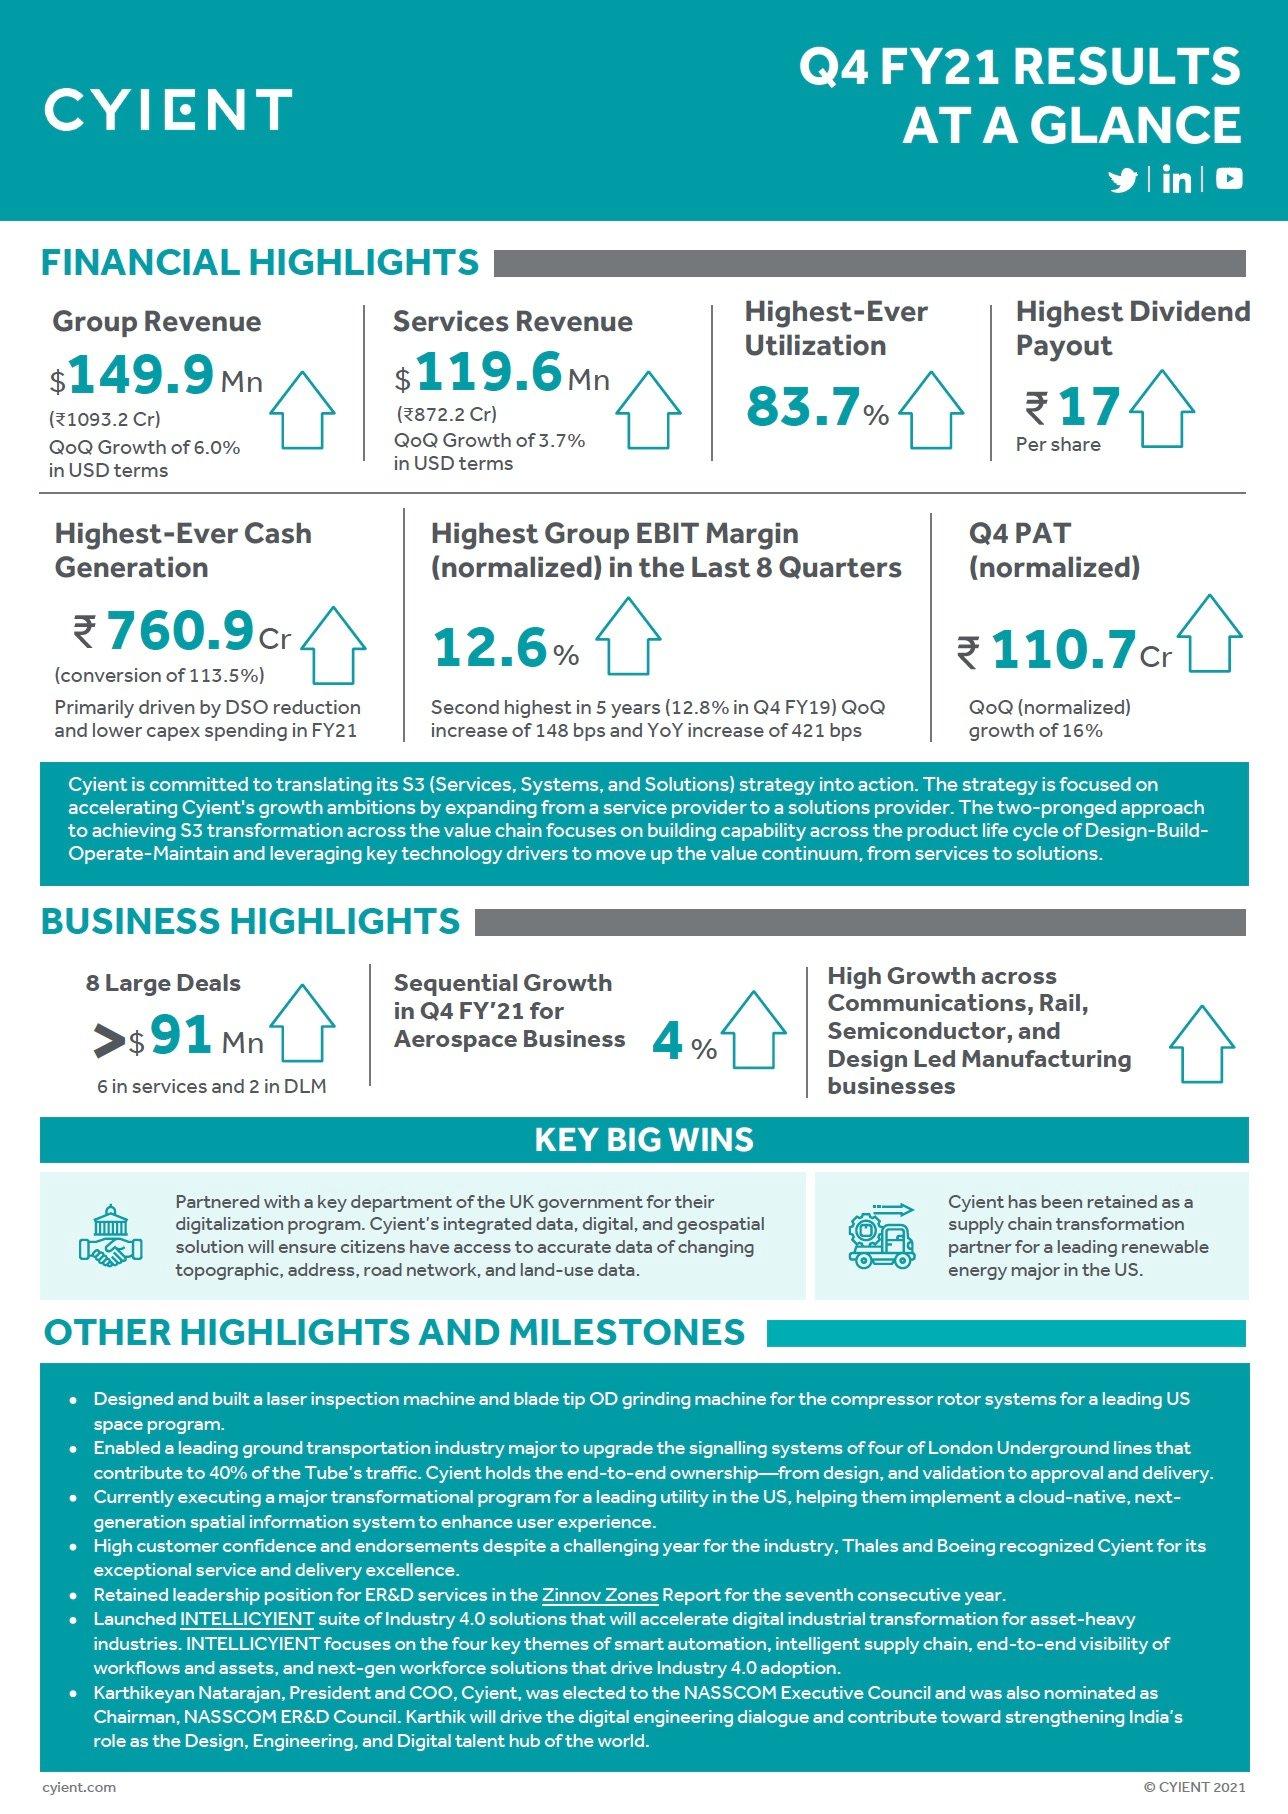 Q4 Infographic